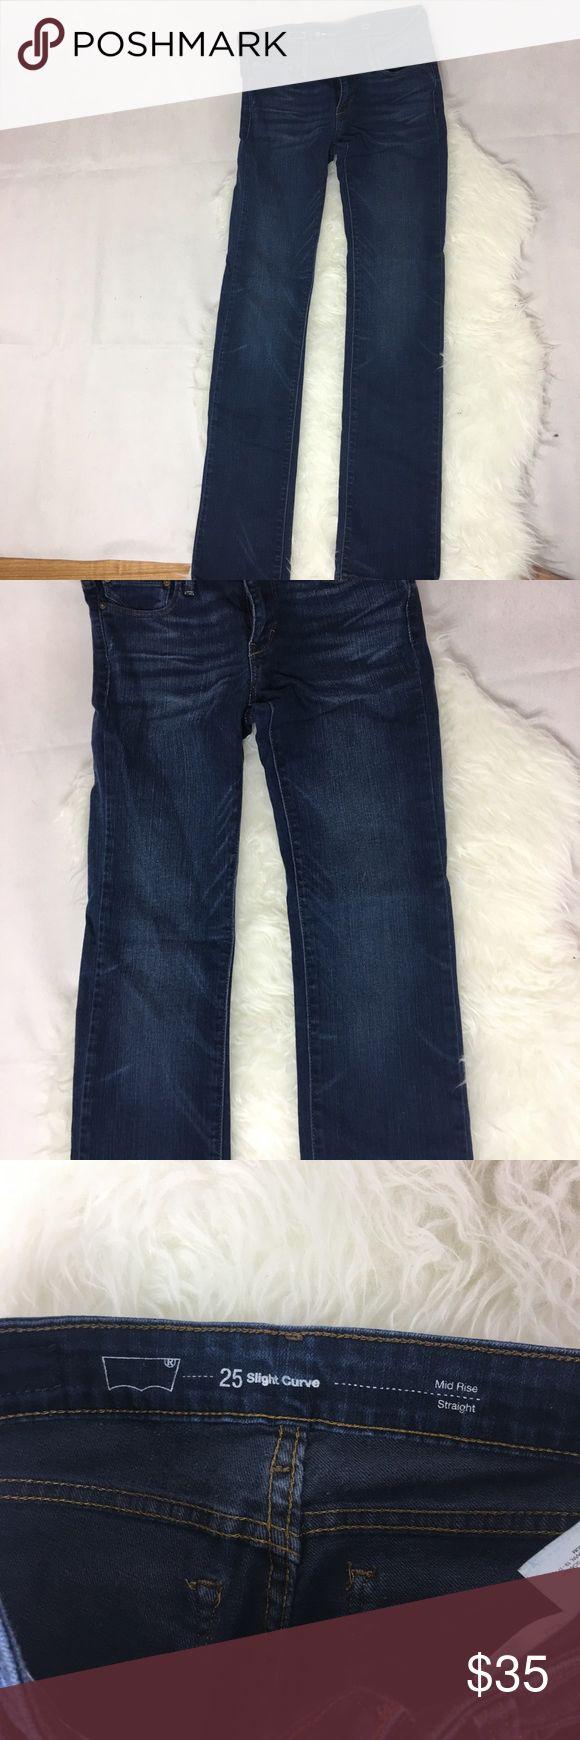 Levi's jeans denim straight mid rise jean women 25 Awesome jeans Levi's Jeans Straight Leg